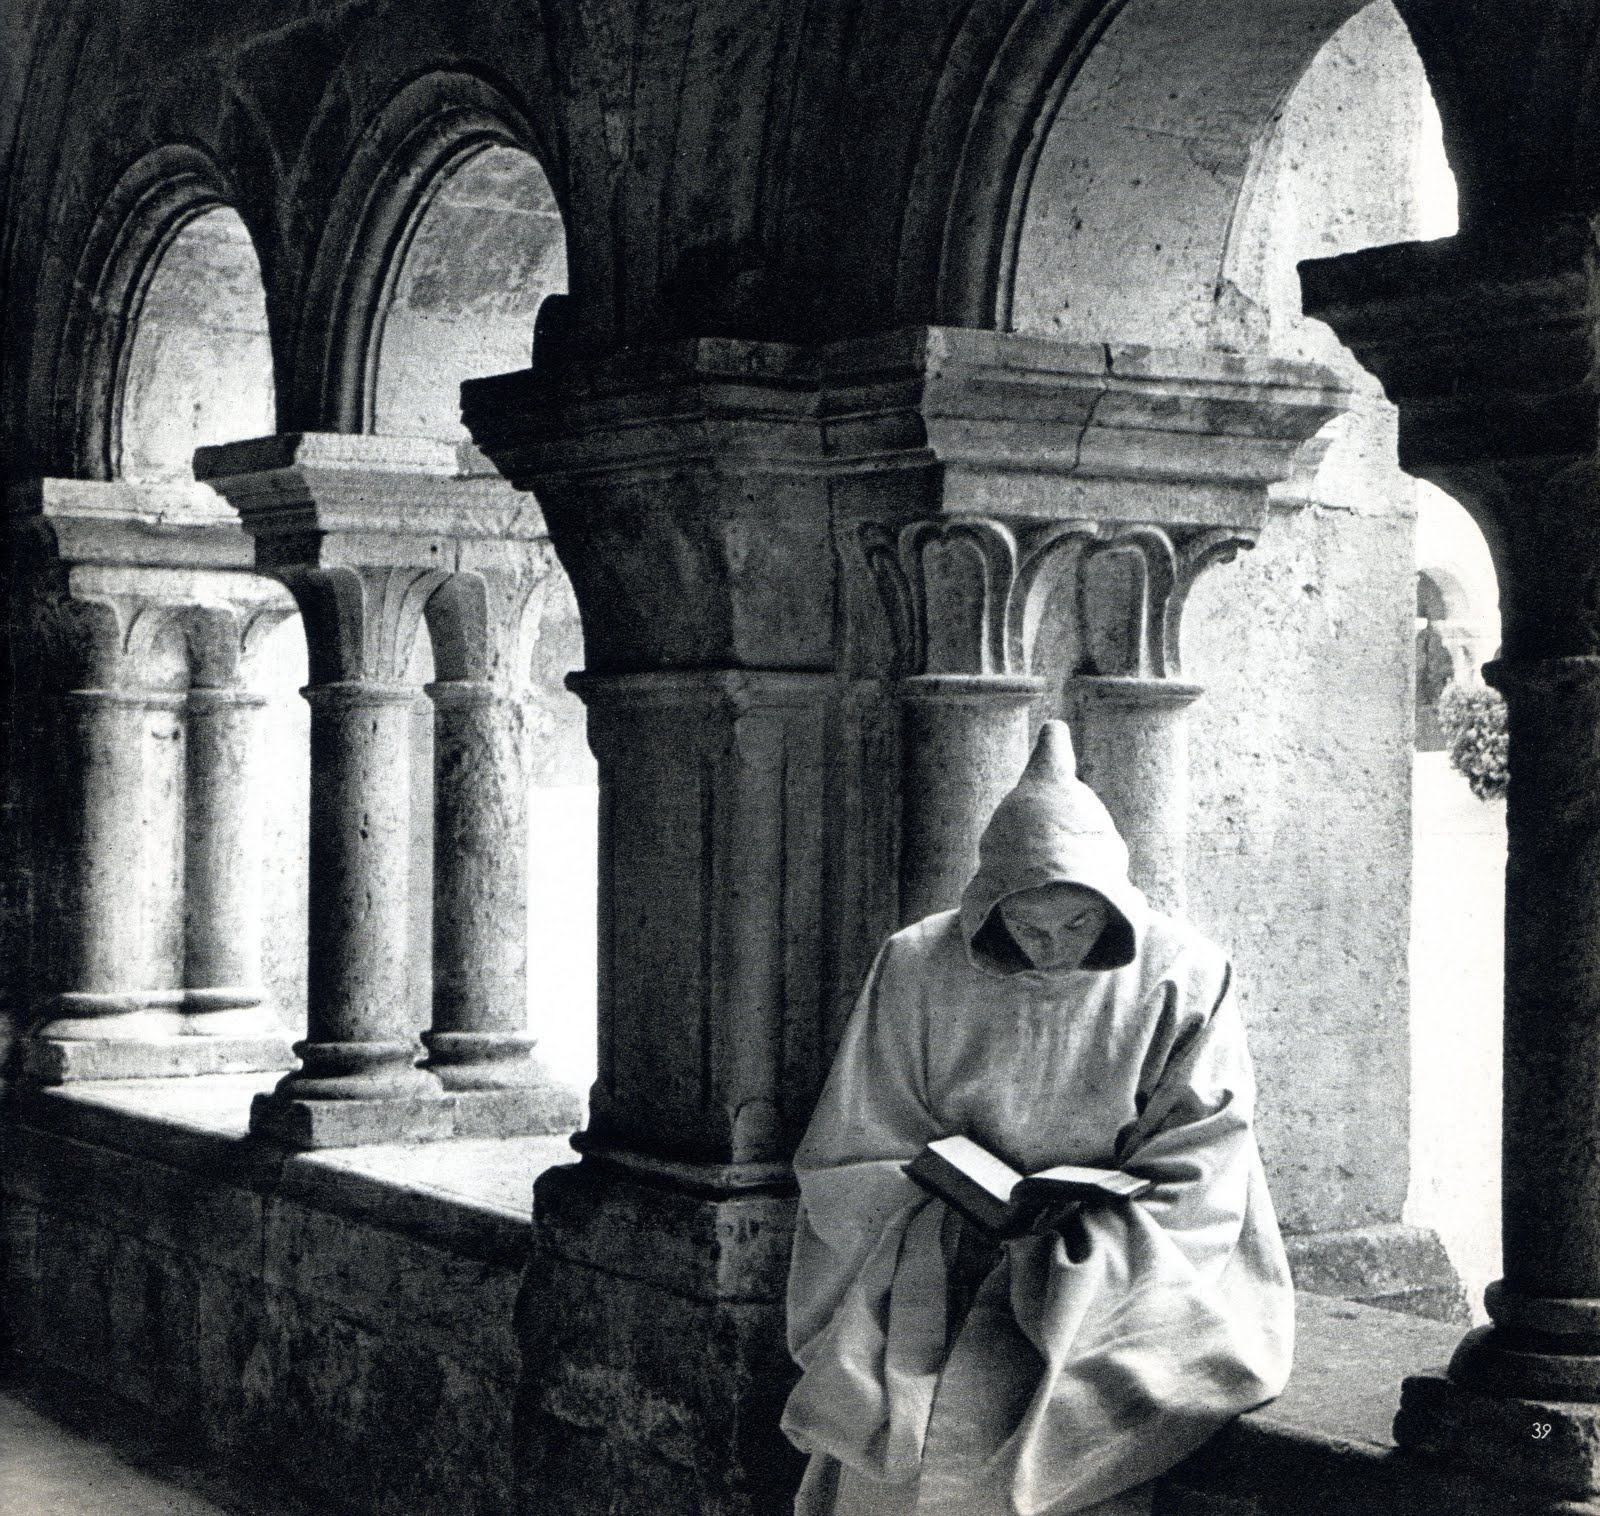 Monastery Garments: Monks Habits | Friars Habits